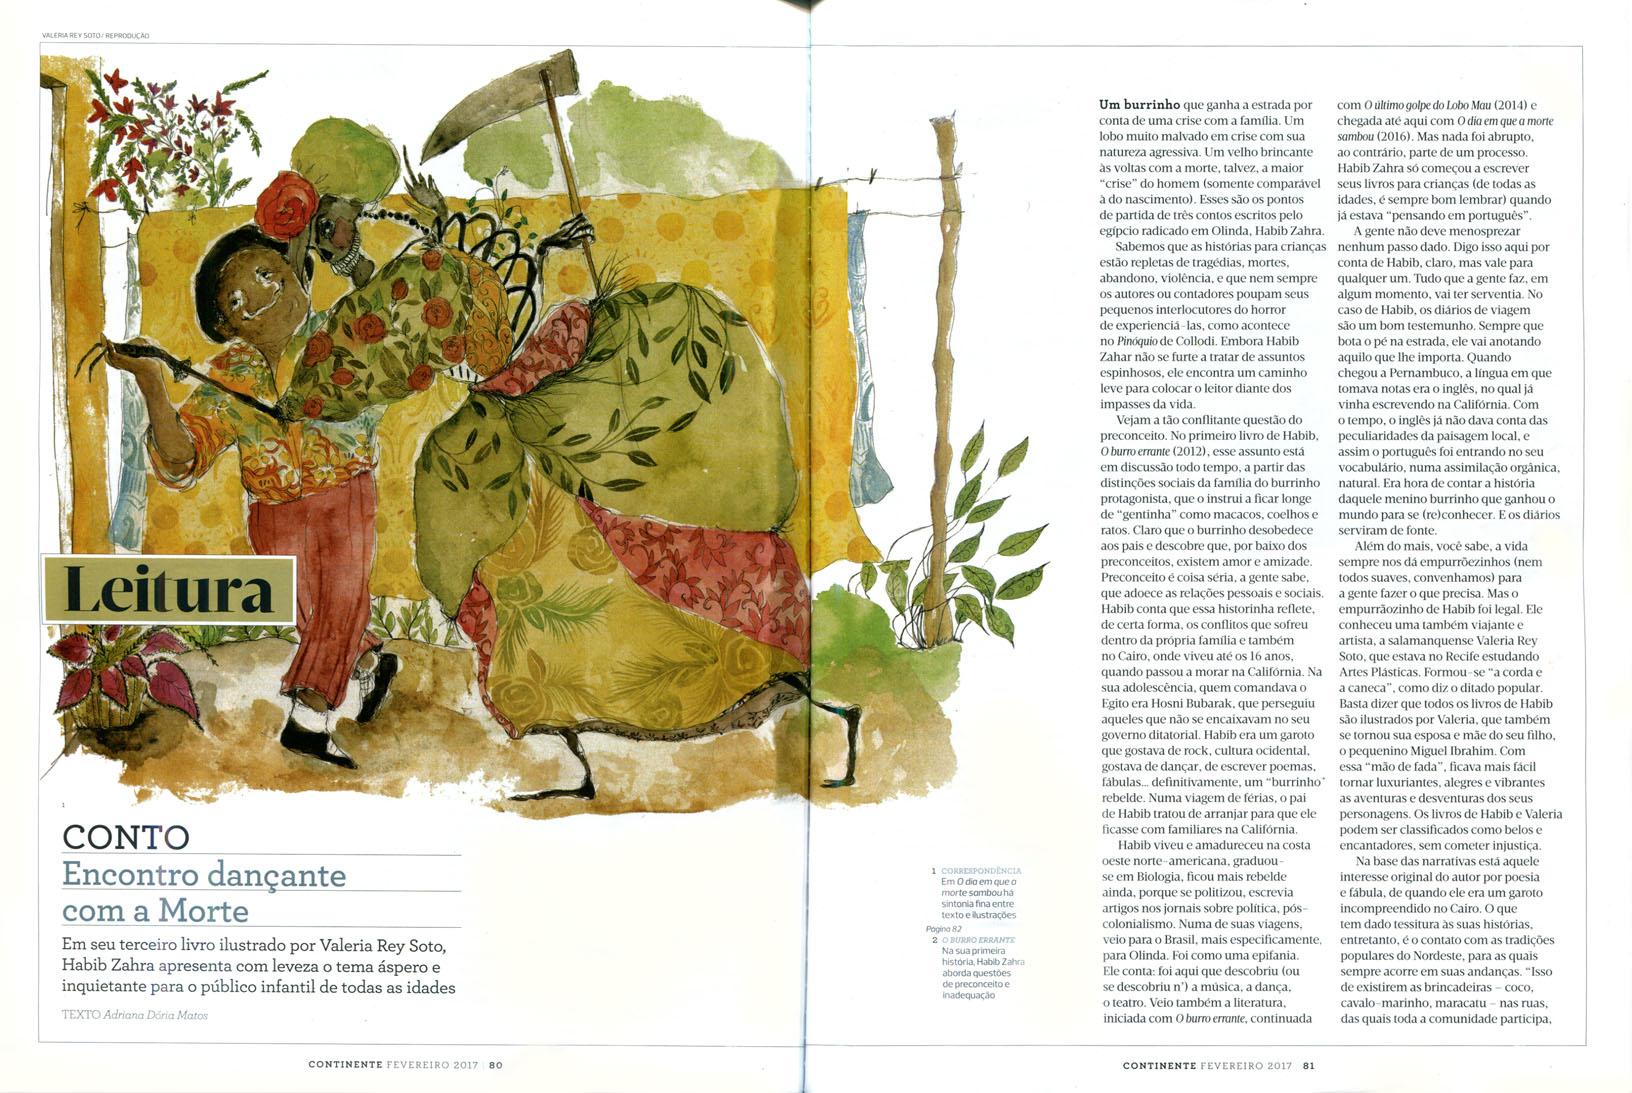 17-02-12 Revista Continente 100 dpi pg.1-2